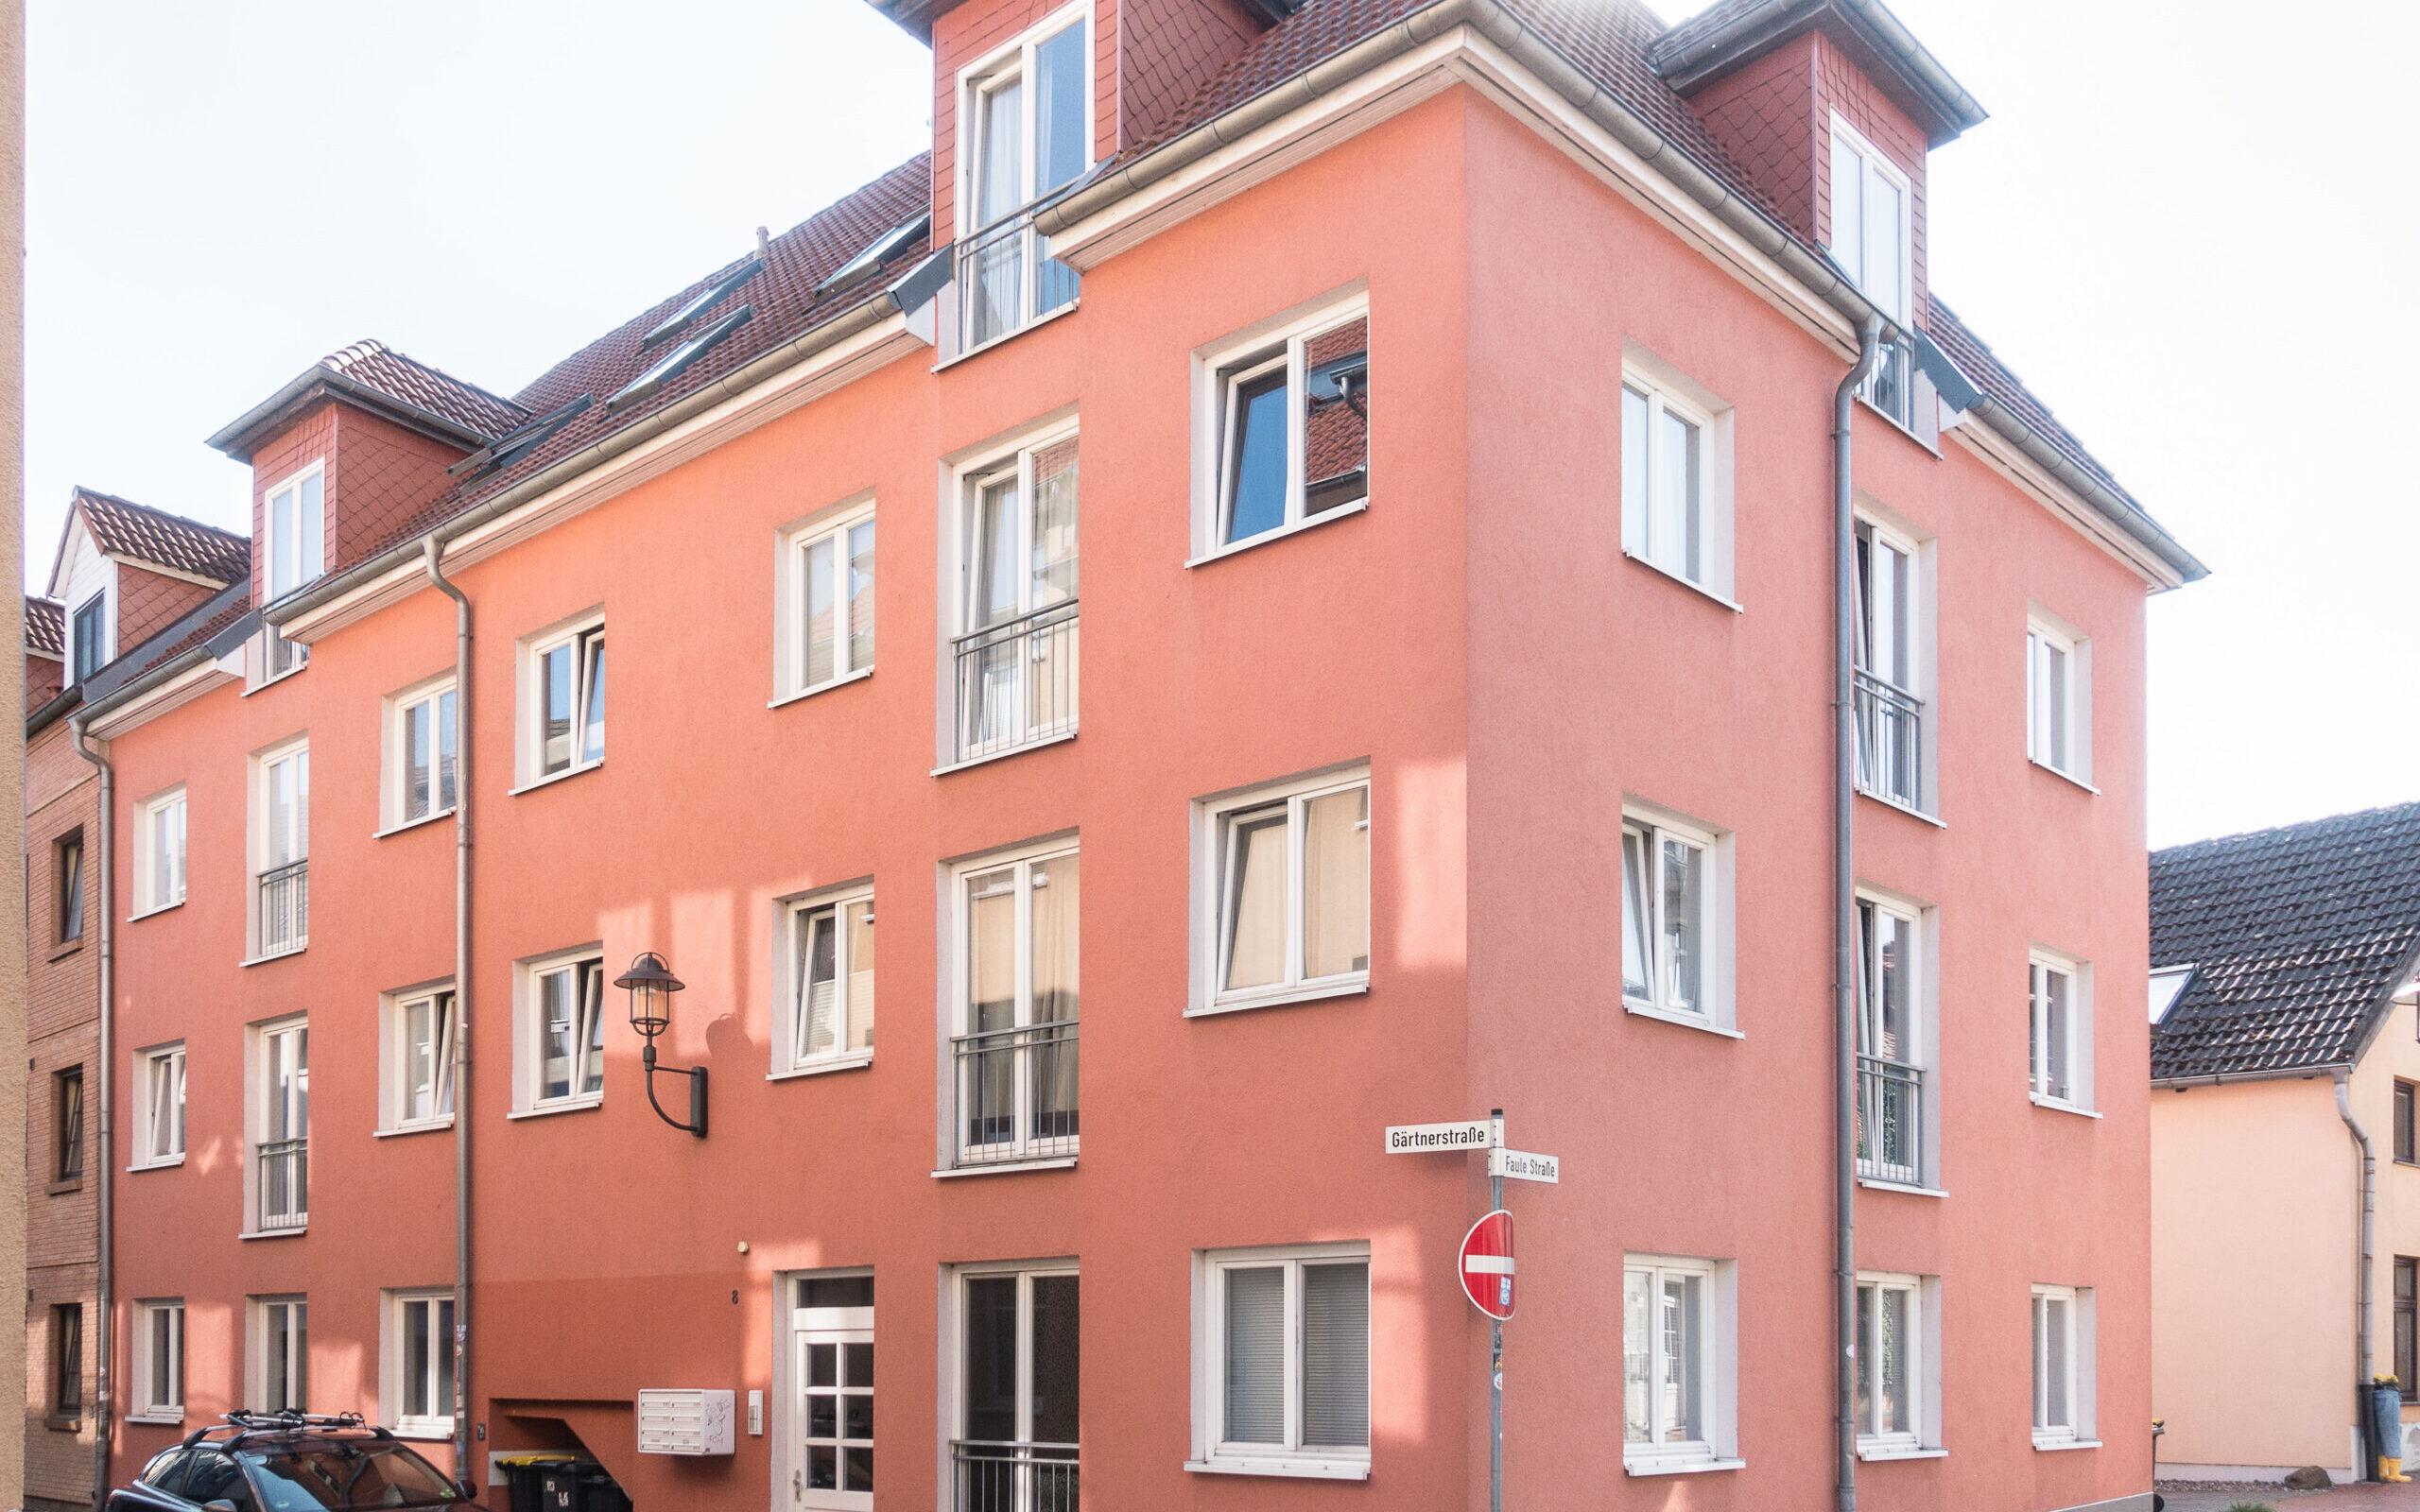 Eigentumswohnung-Rostock-3